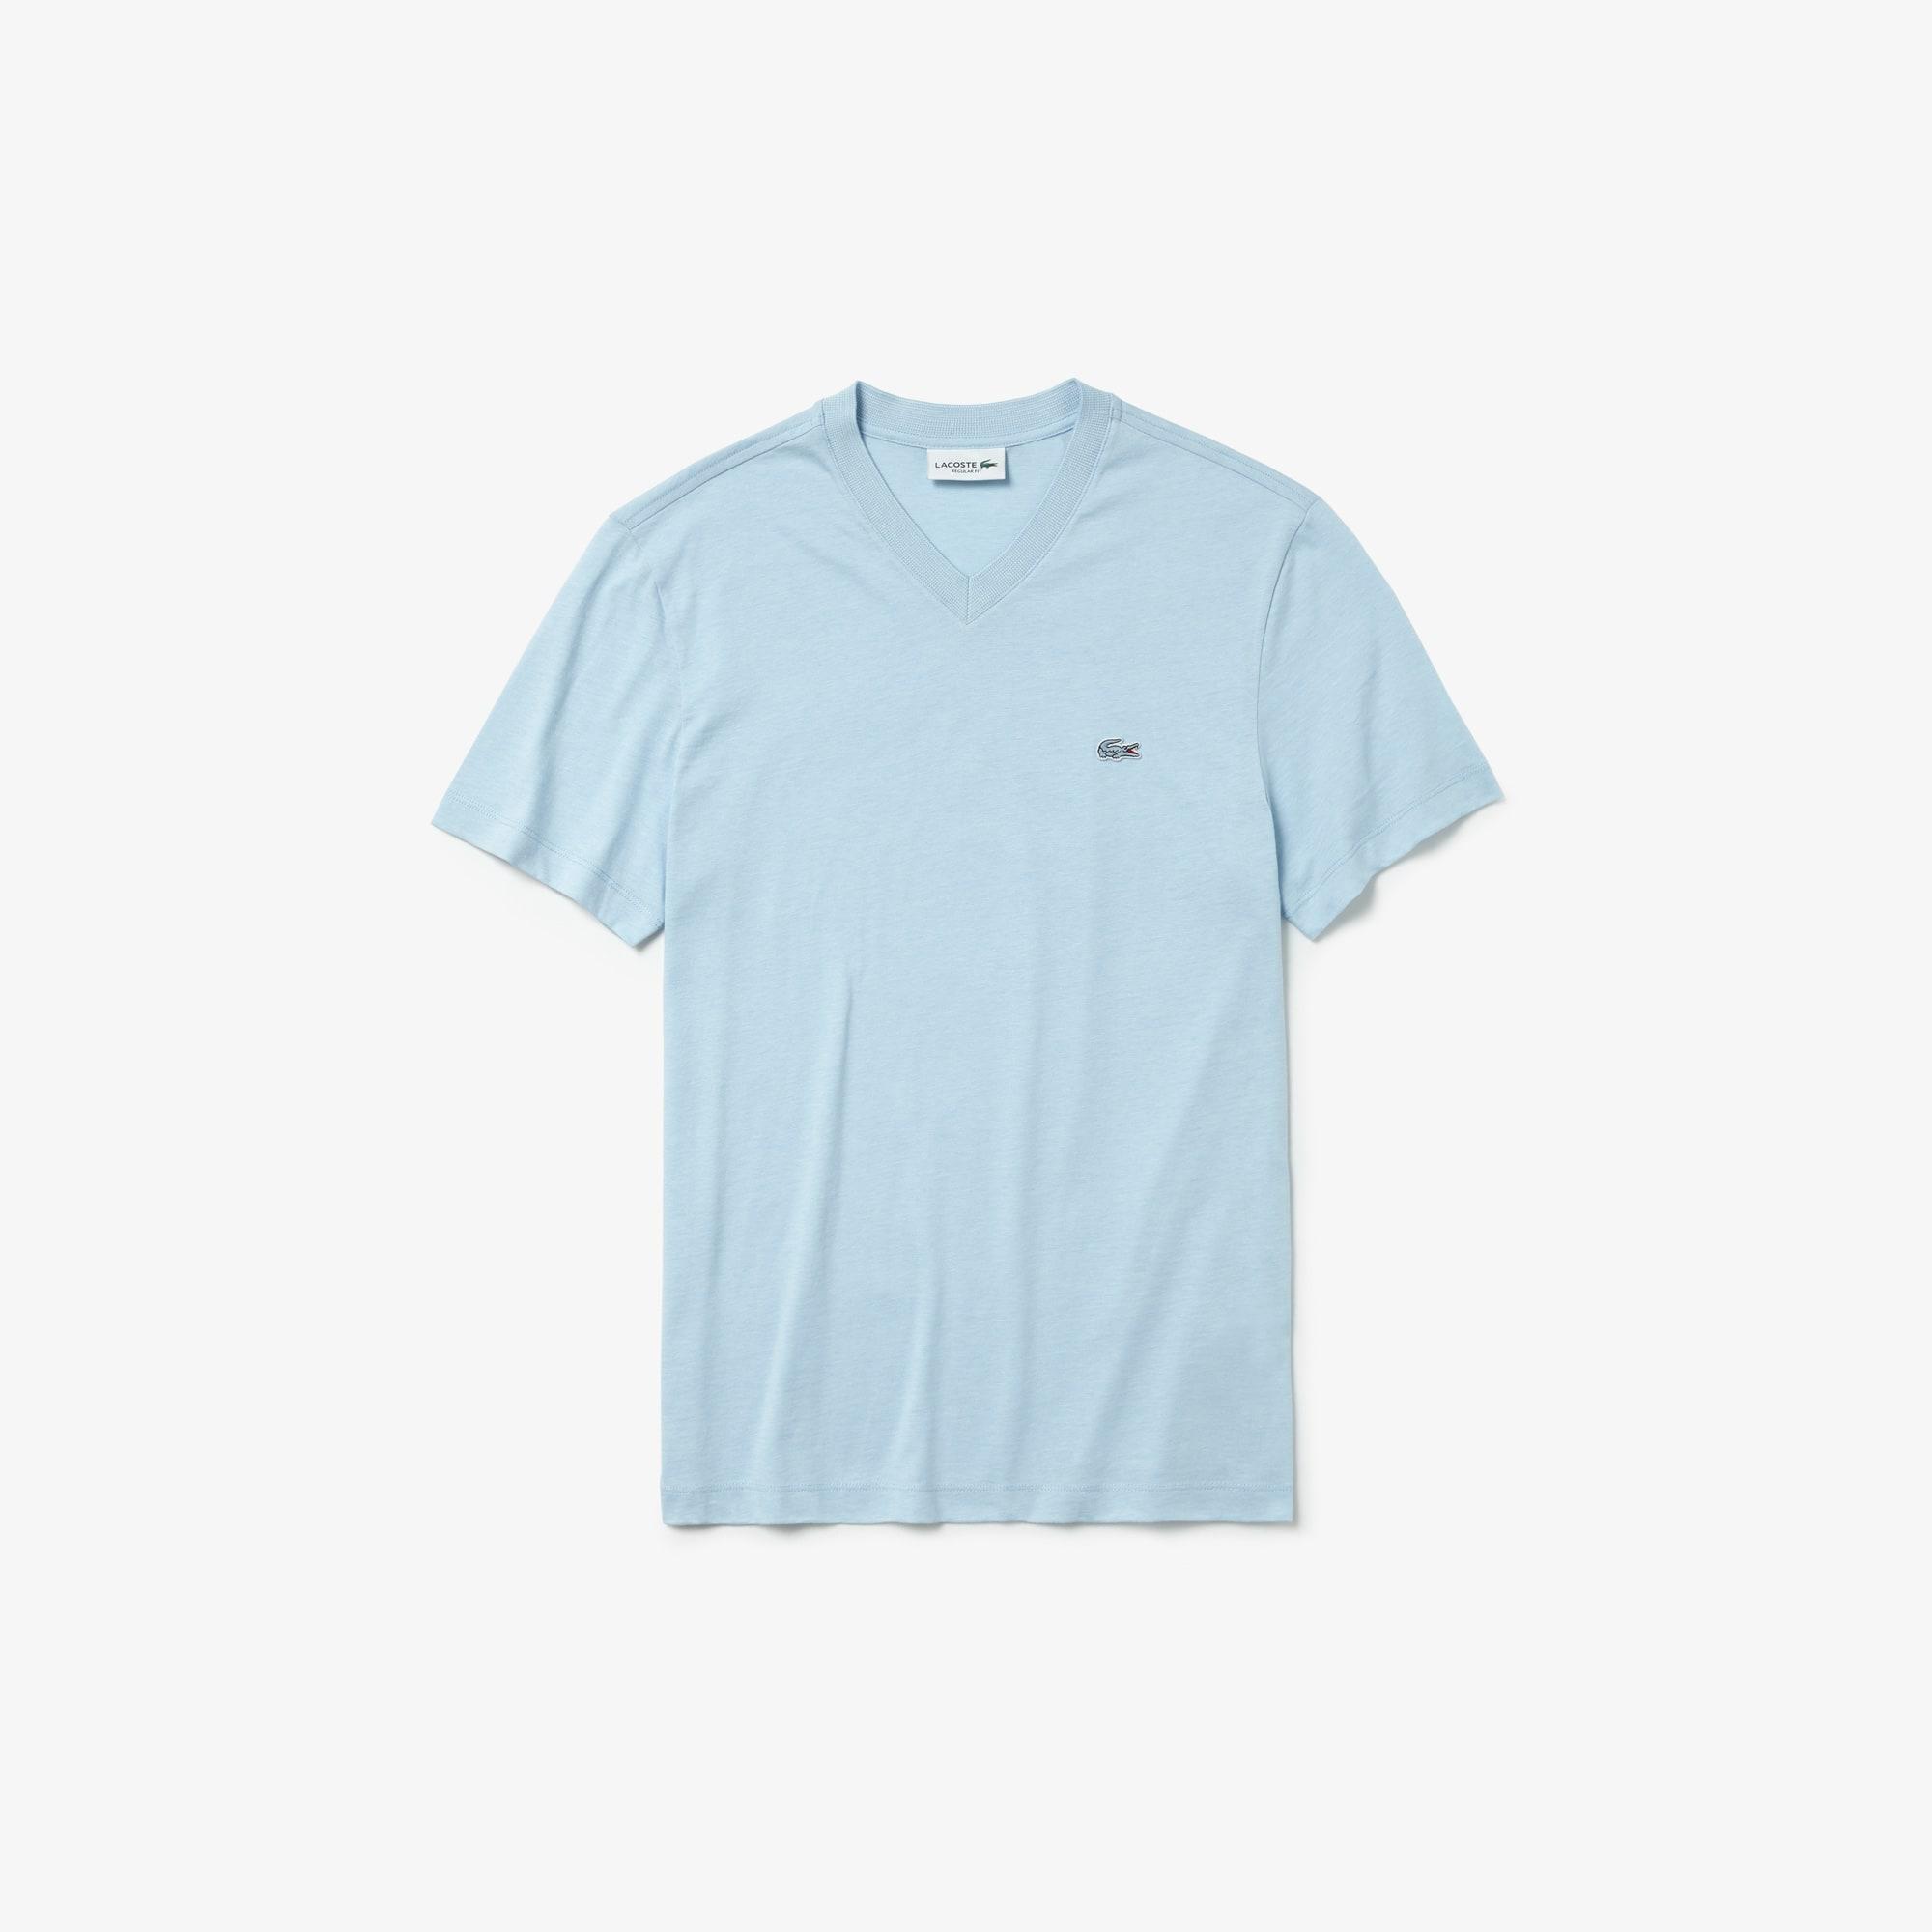 Men's V-Neck Cotton T-shirt